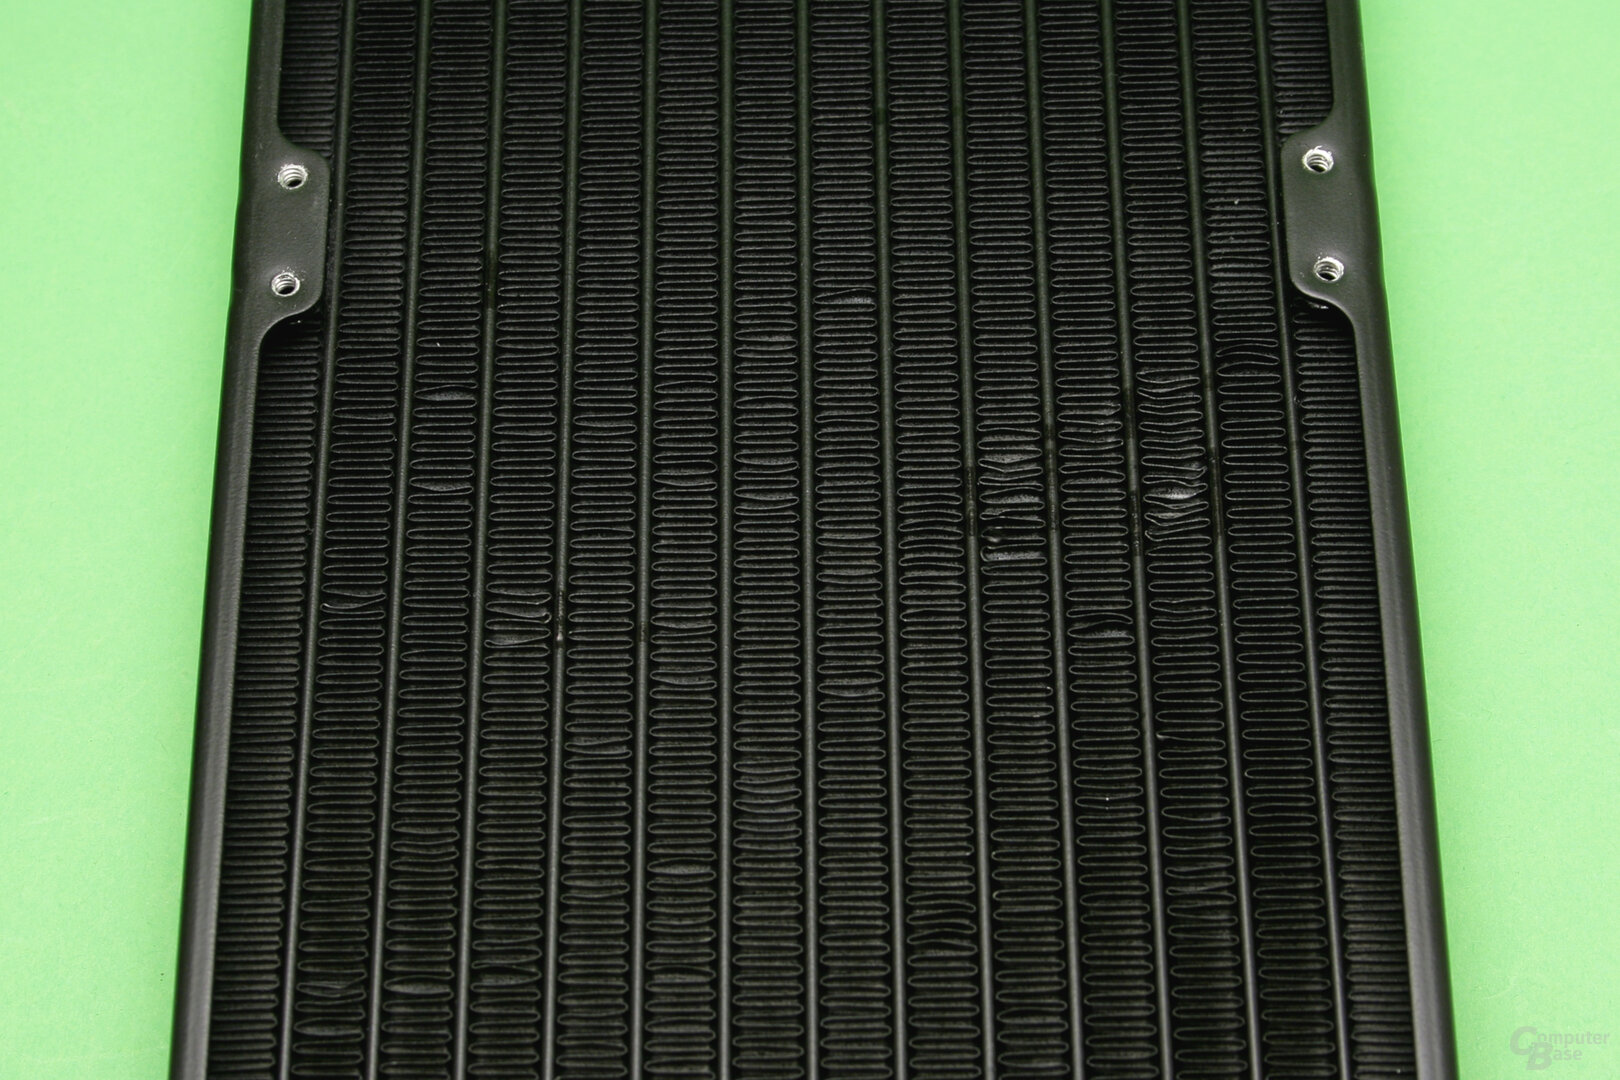 Aorus Liquid Cooler 280: Am Radiator sind einige Lamellen verbogen